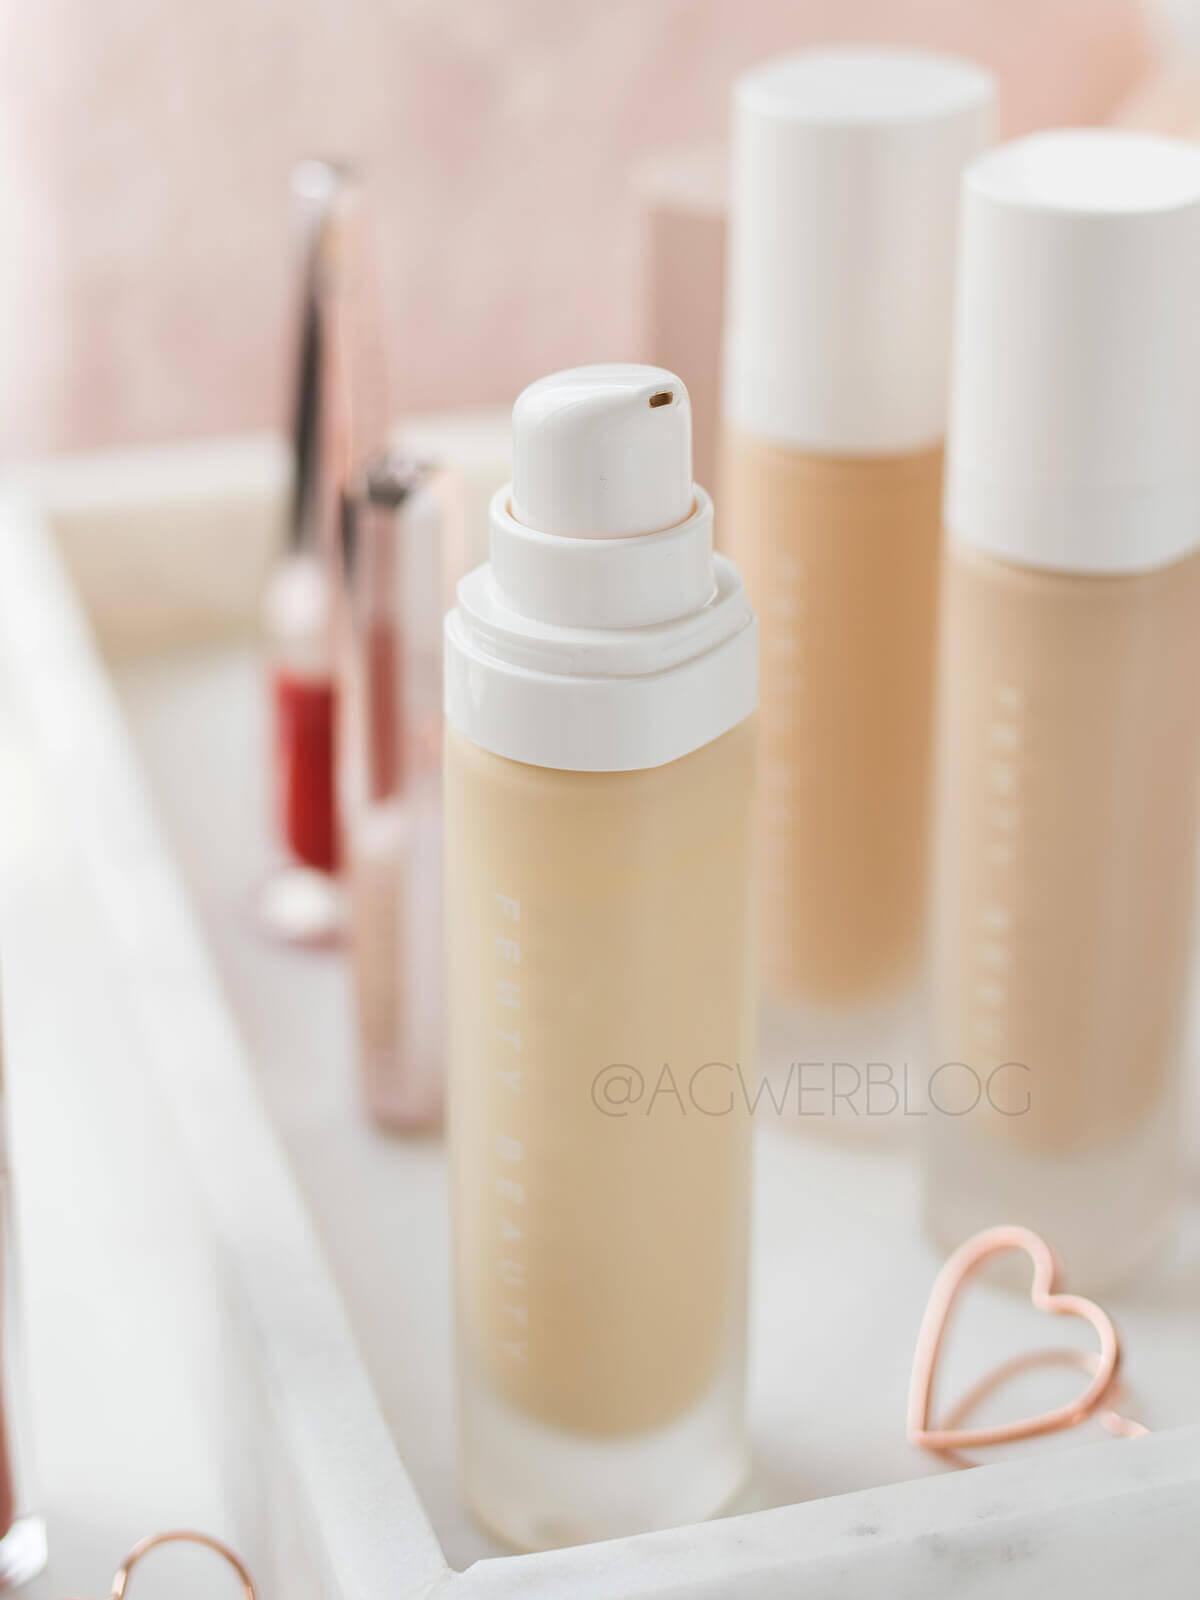 fenty beauty pro filt'r foundation opinie